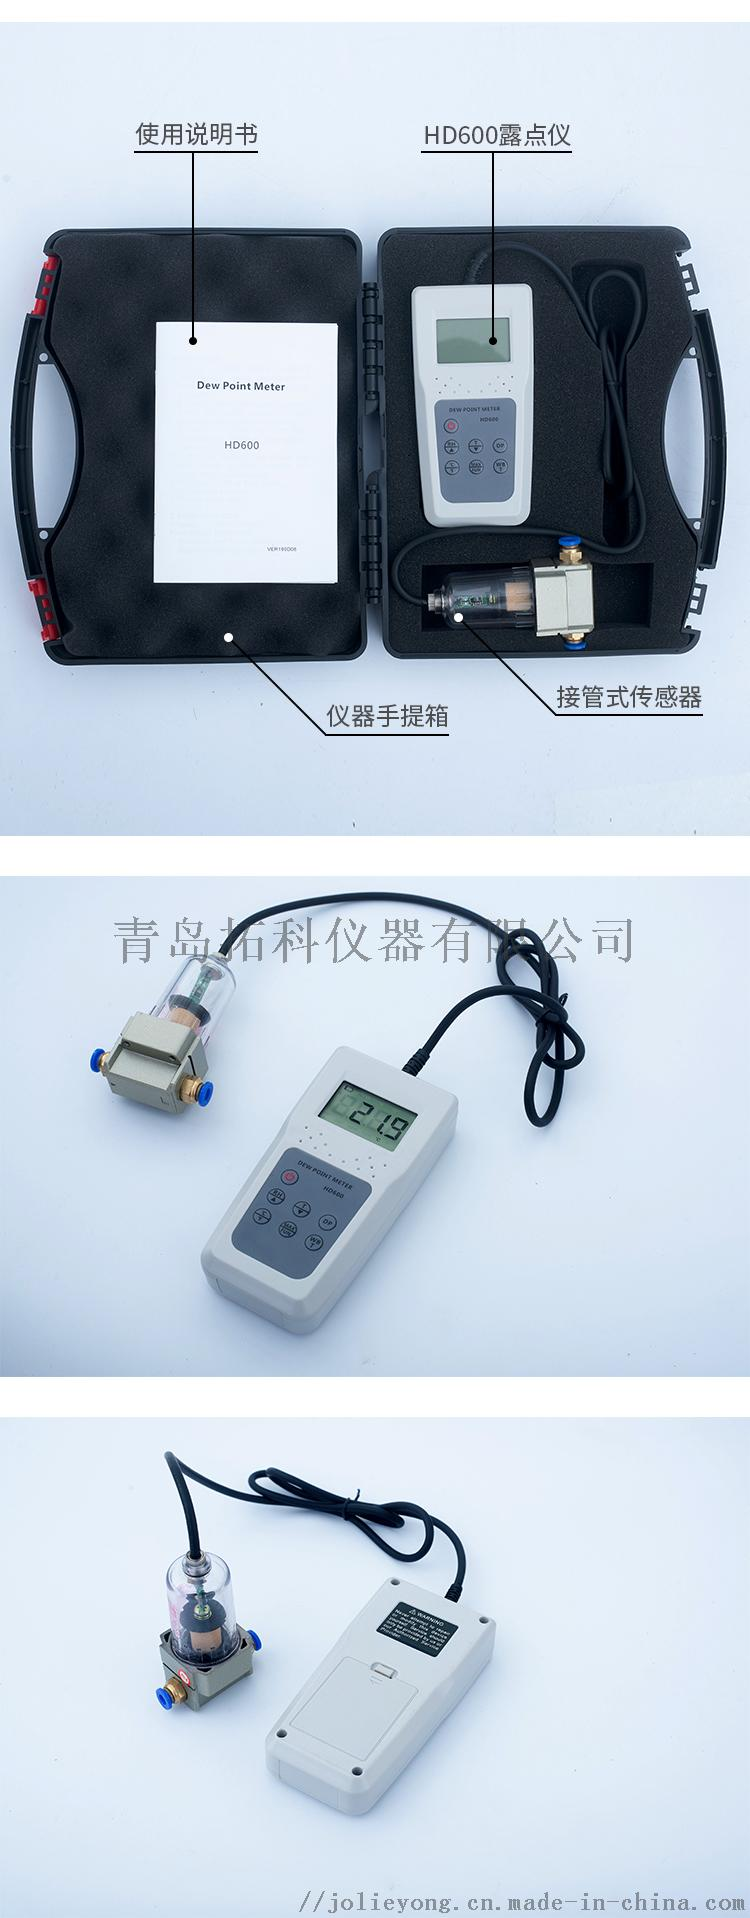 HD600露点仪_08.jpg